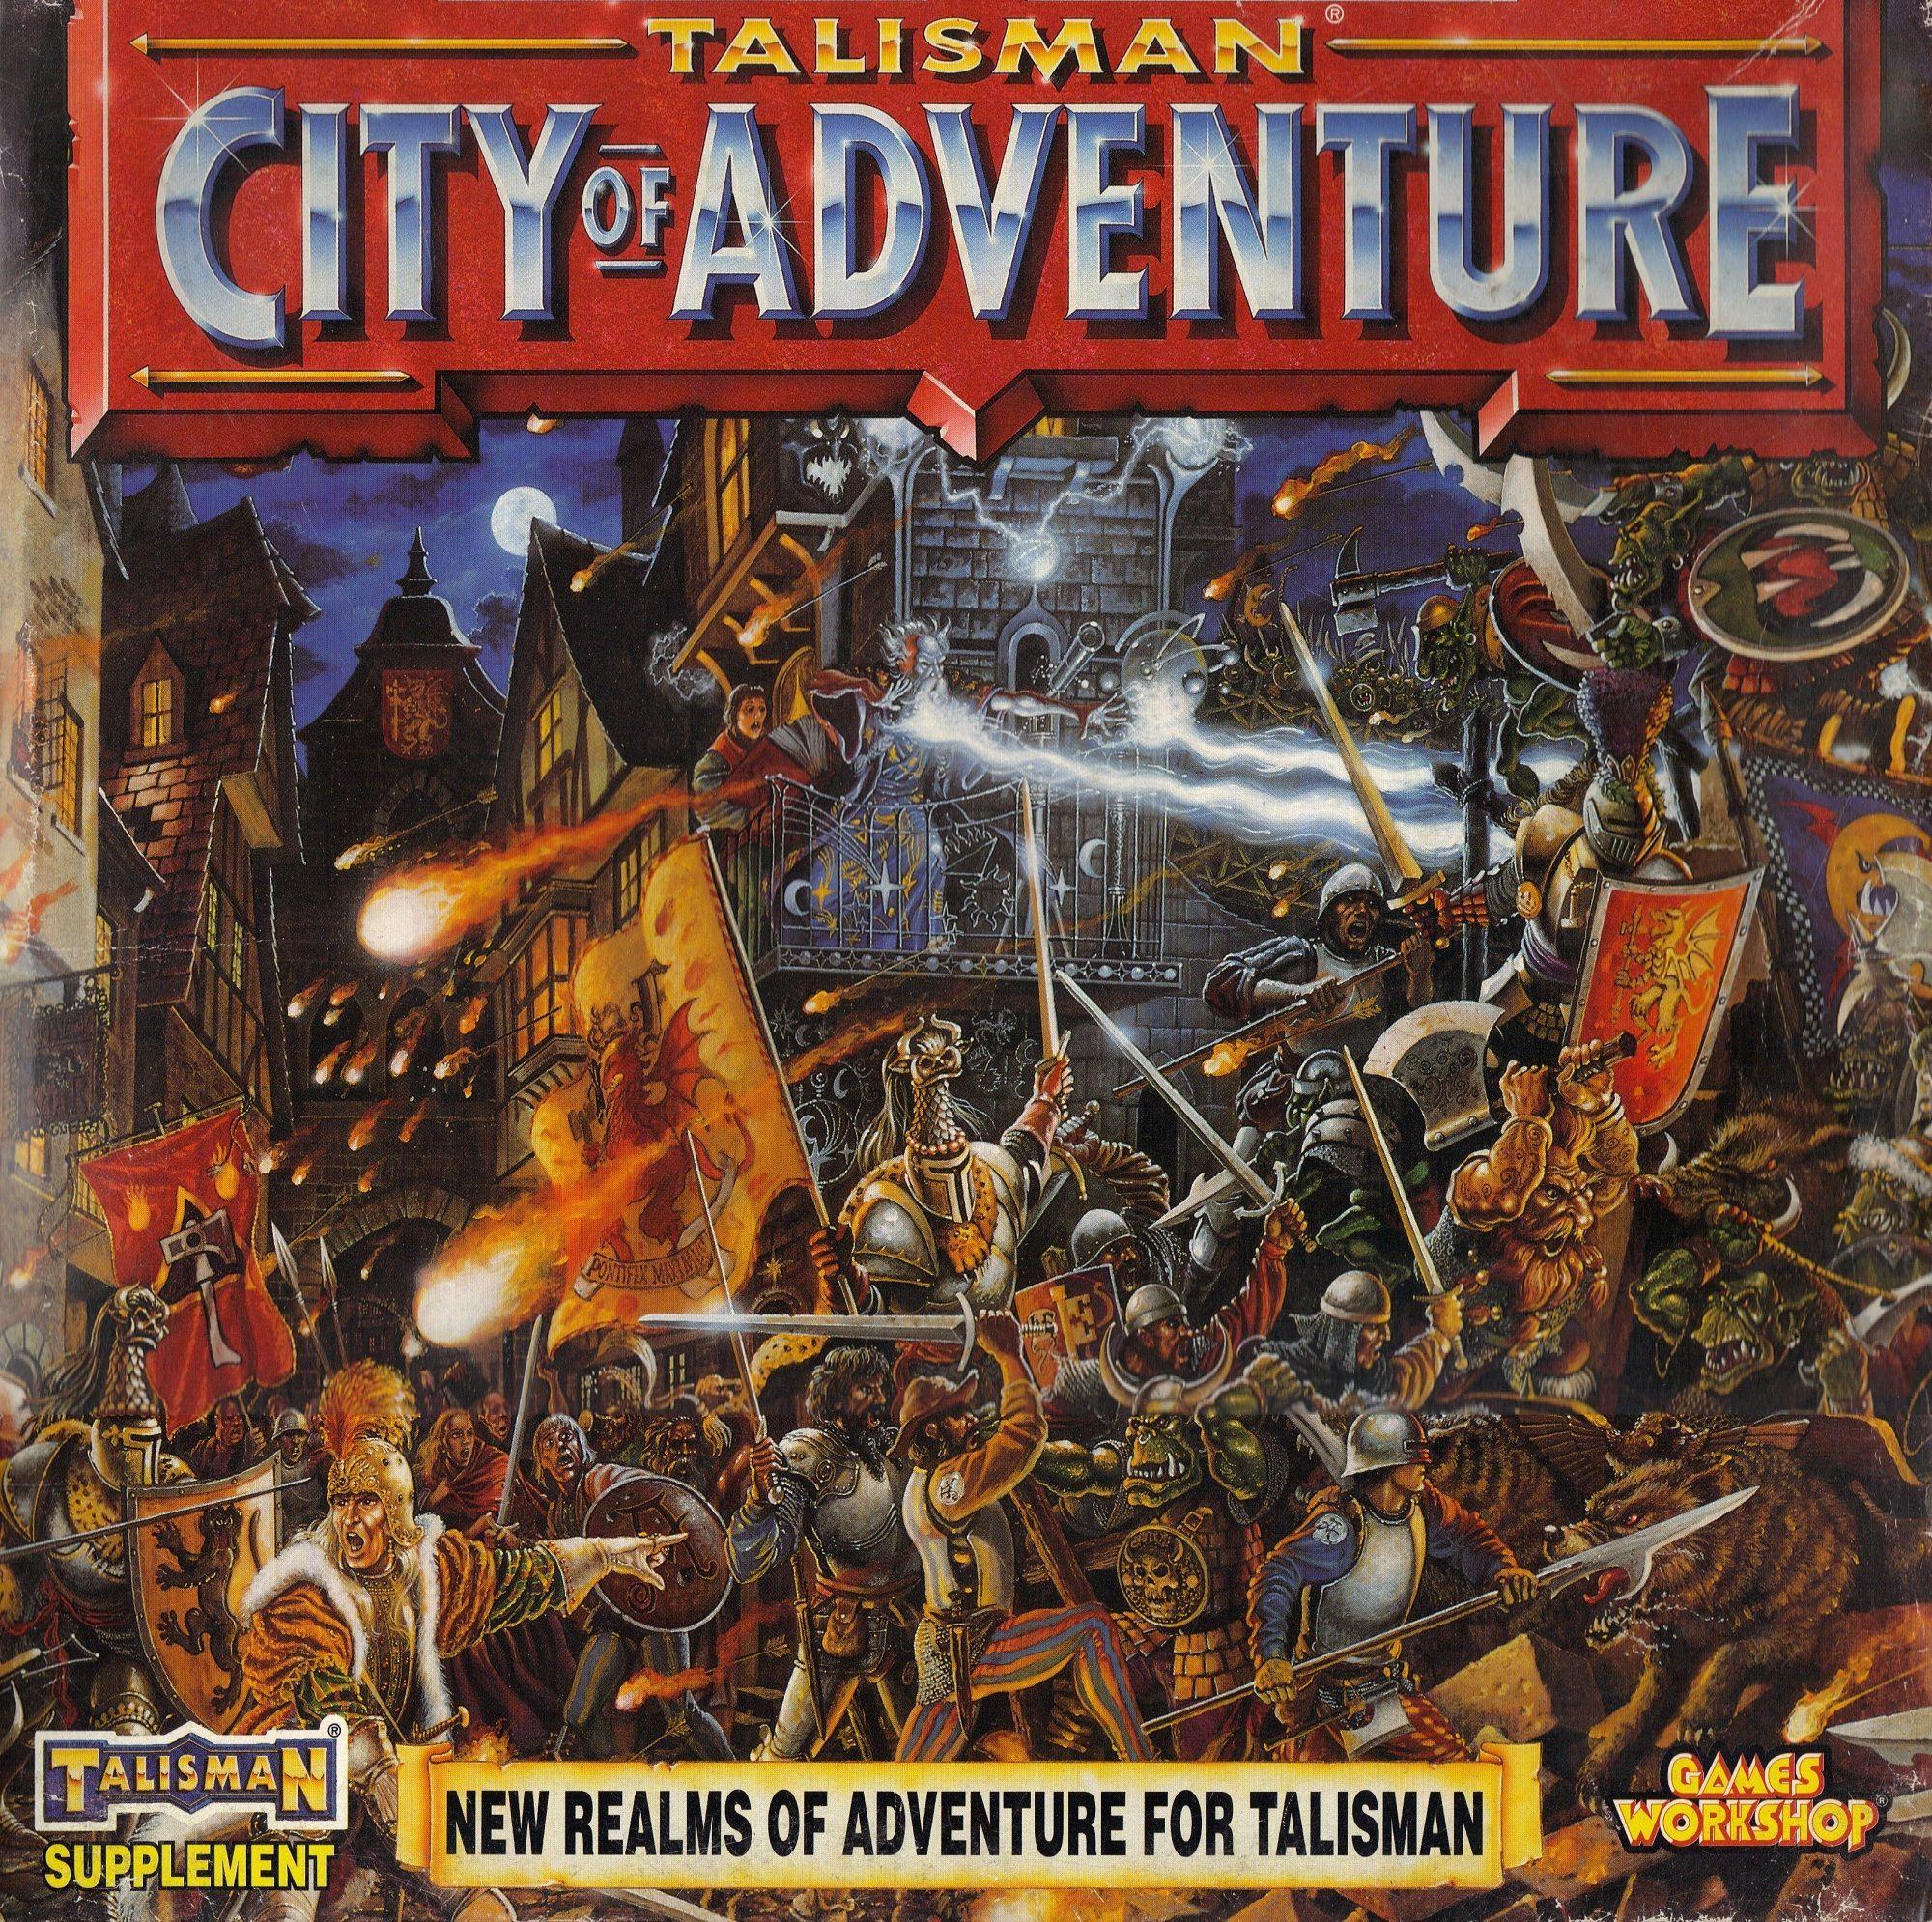 Talisman (third edition): City of Adventure